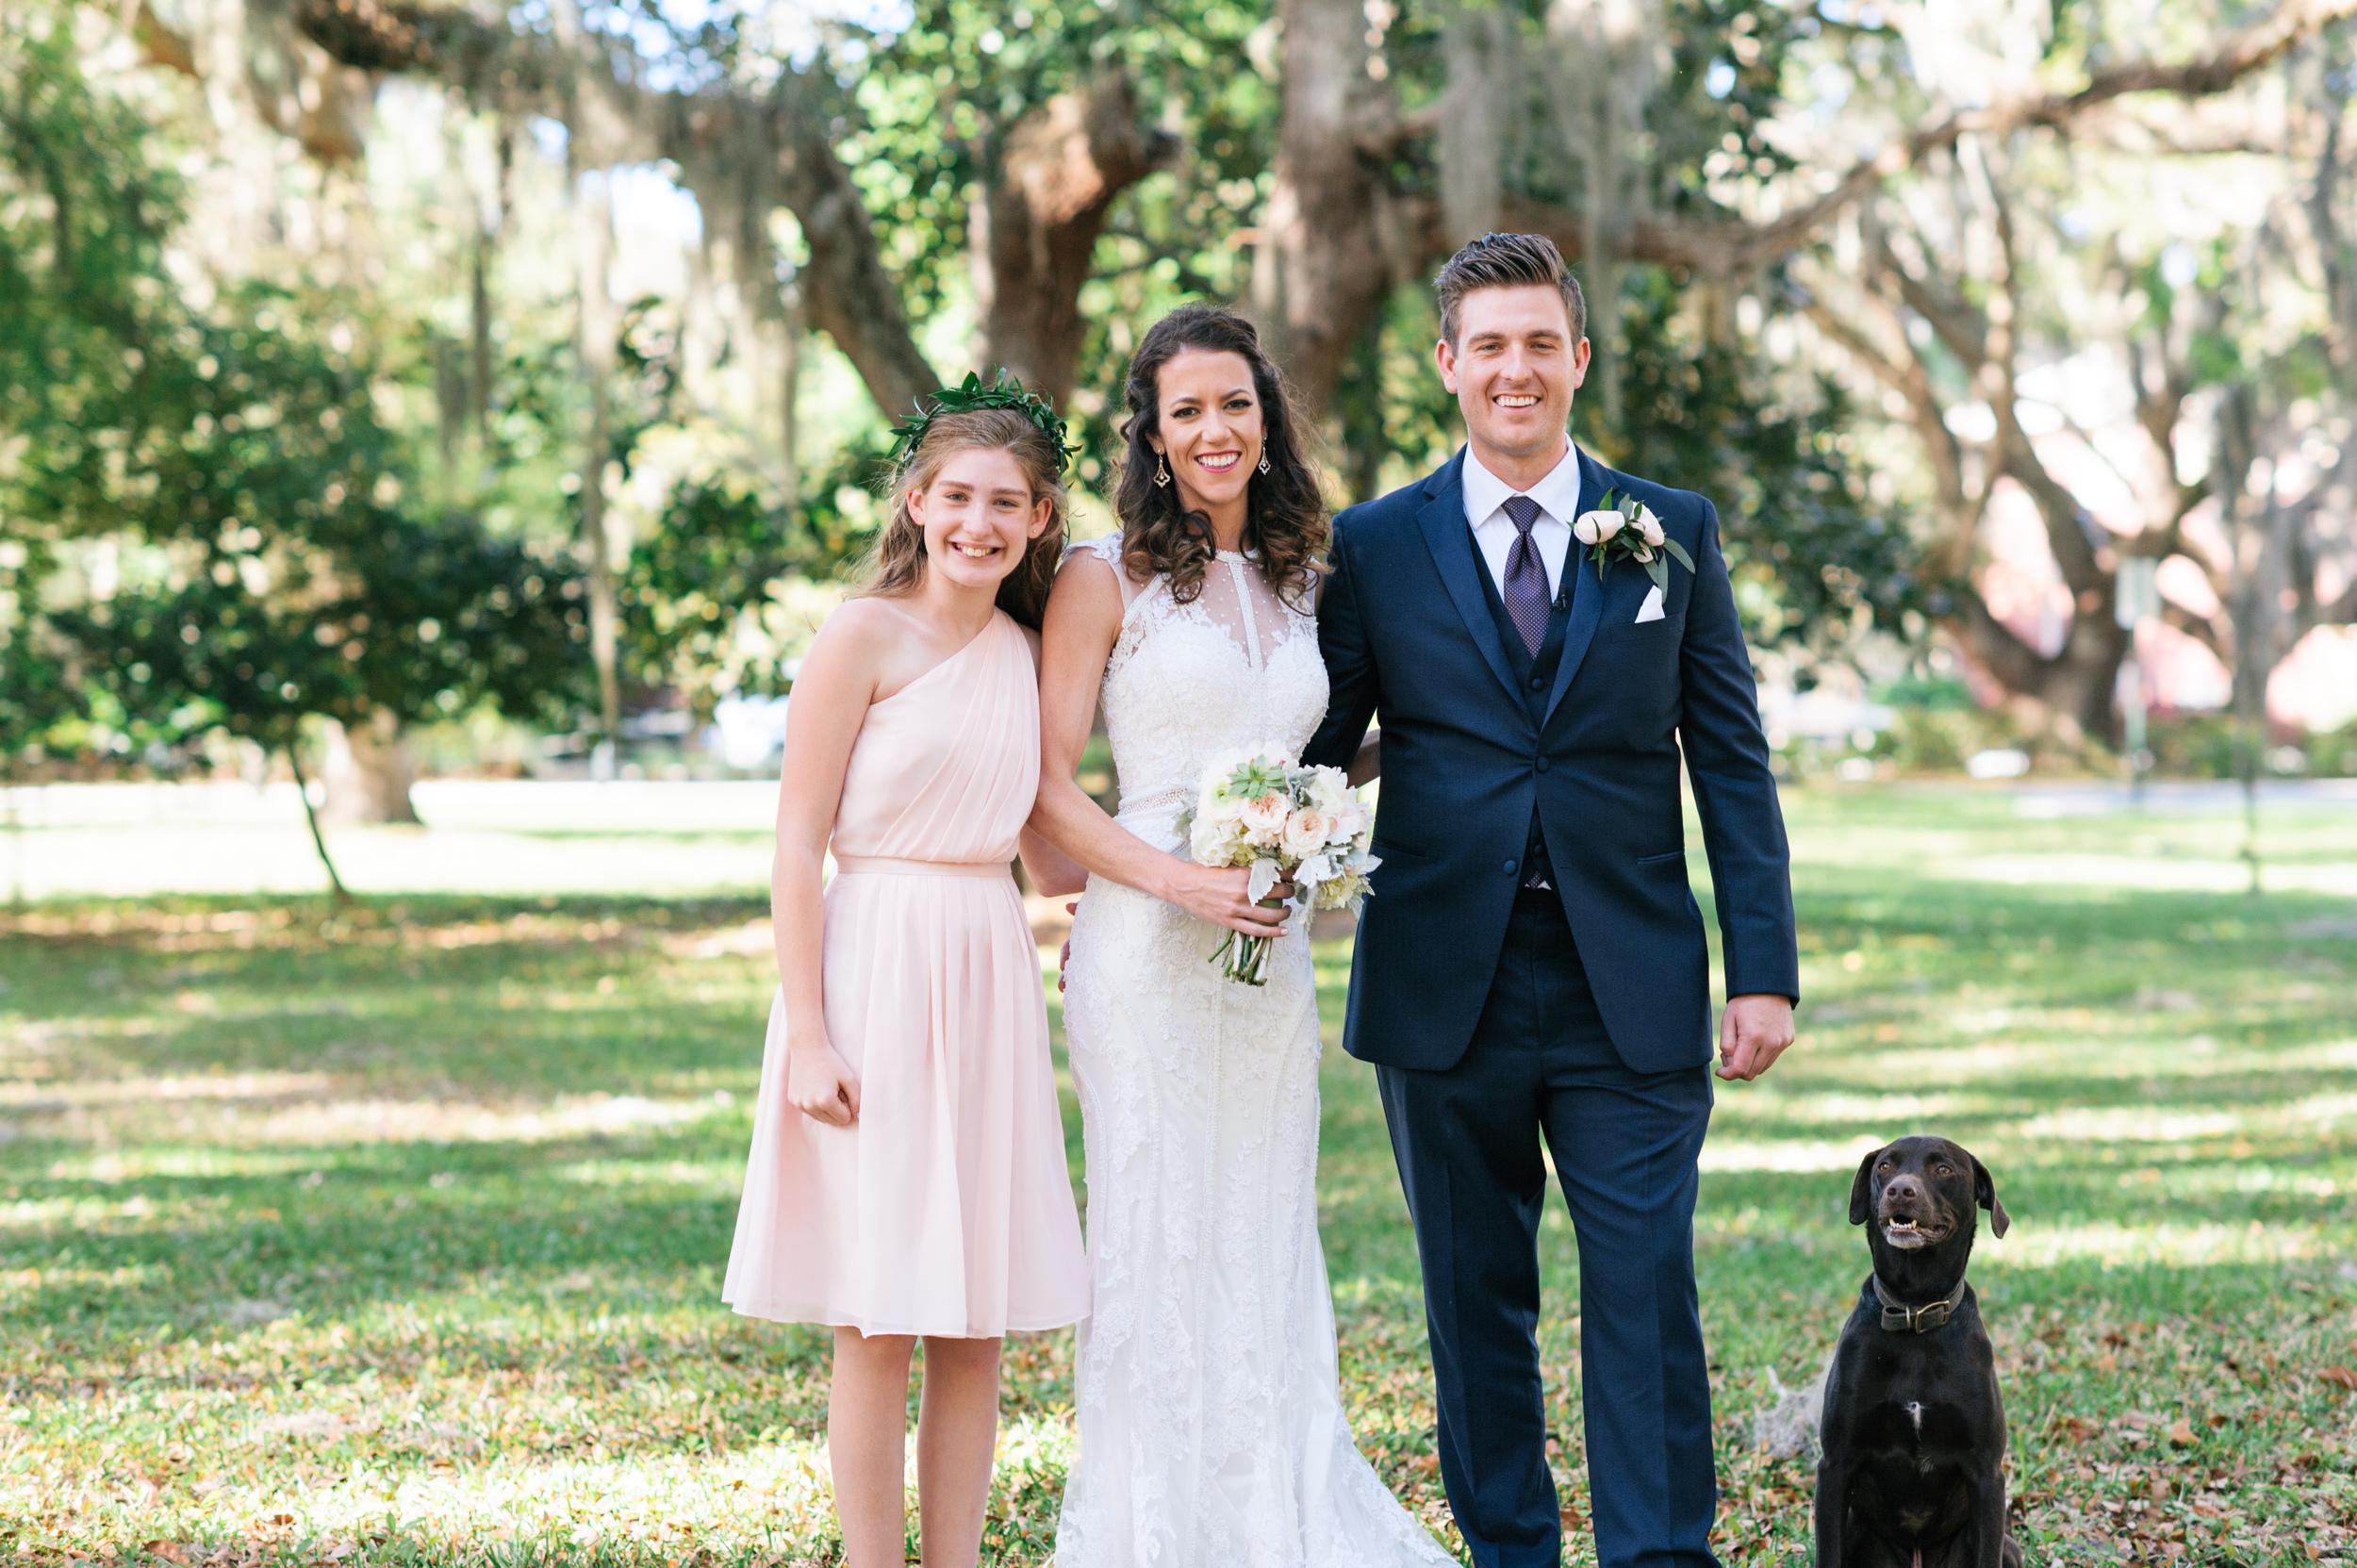 kadi-and-matt-carroll-april-9-2016-jekyl-island-wedding-m-newsom-photography- (326 of 744).jpg